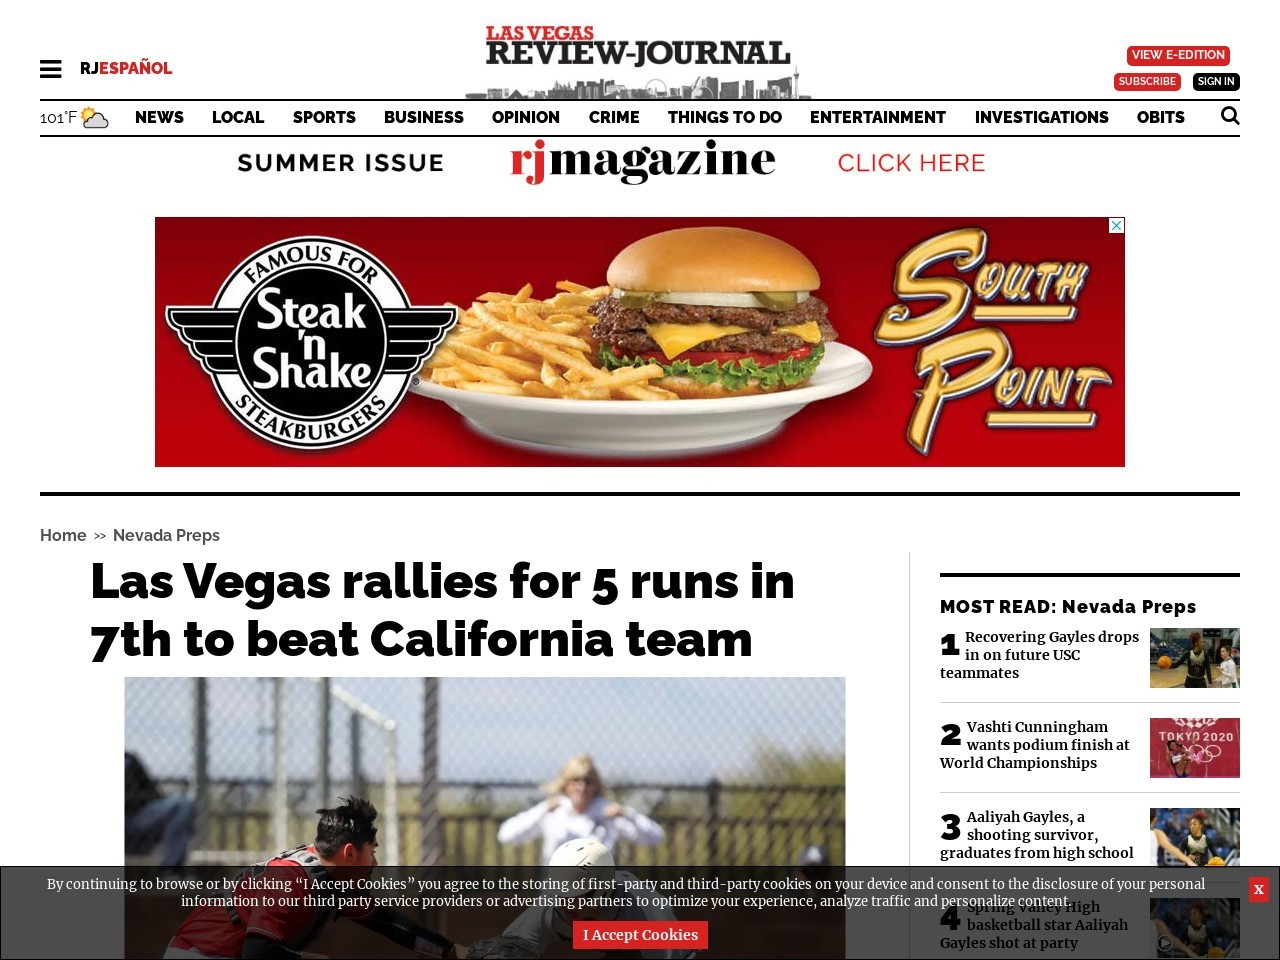 Las Vegas rallies for 5 runs in 7th to beat California team